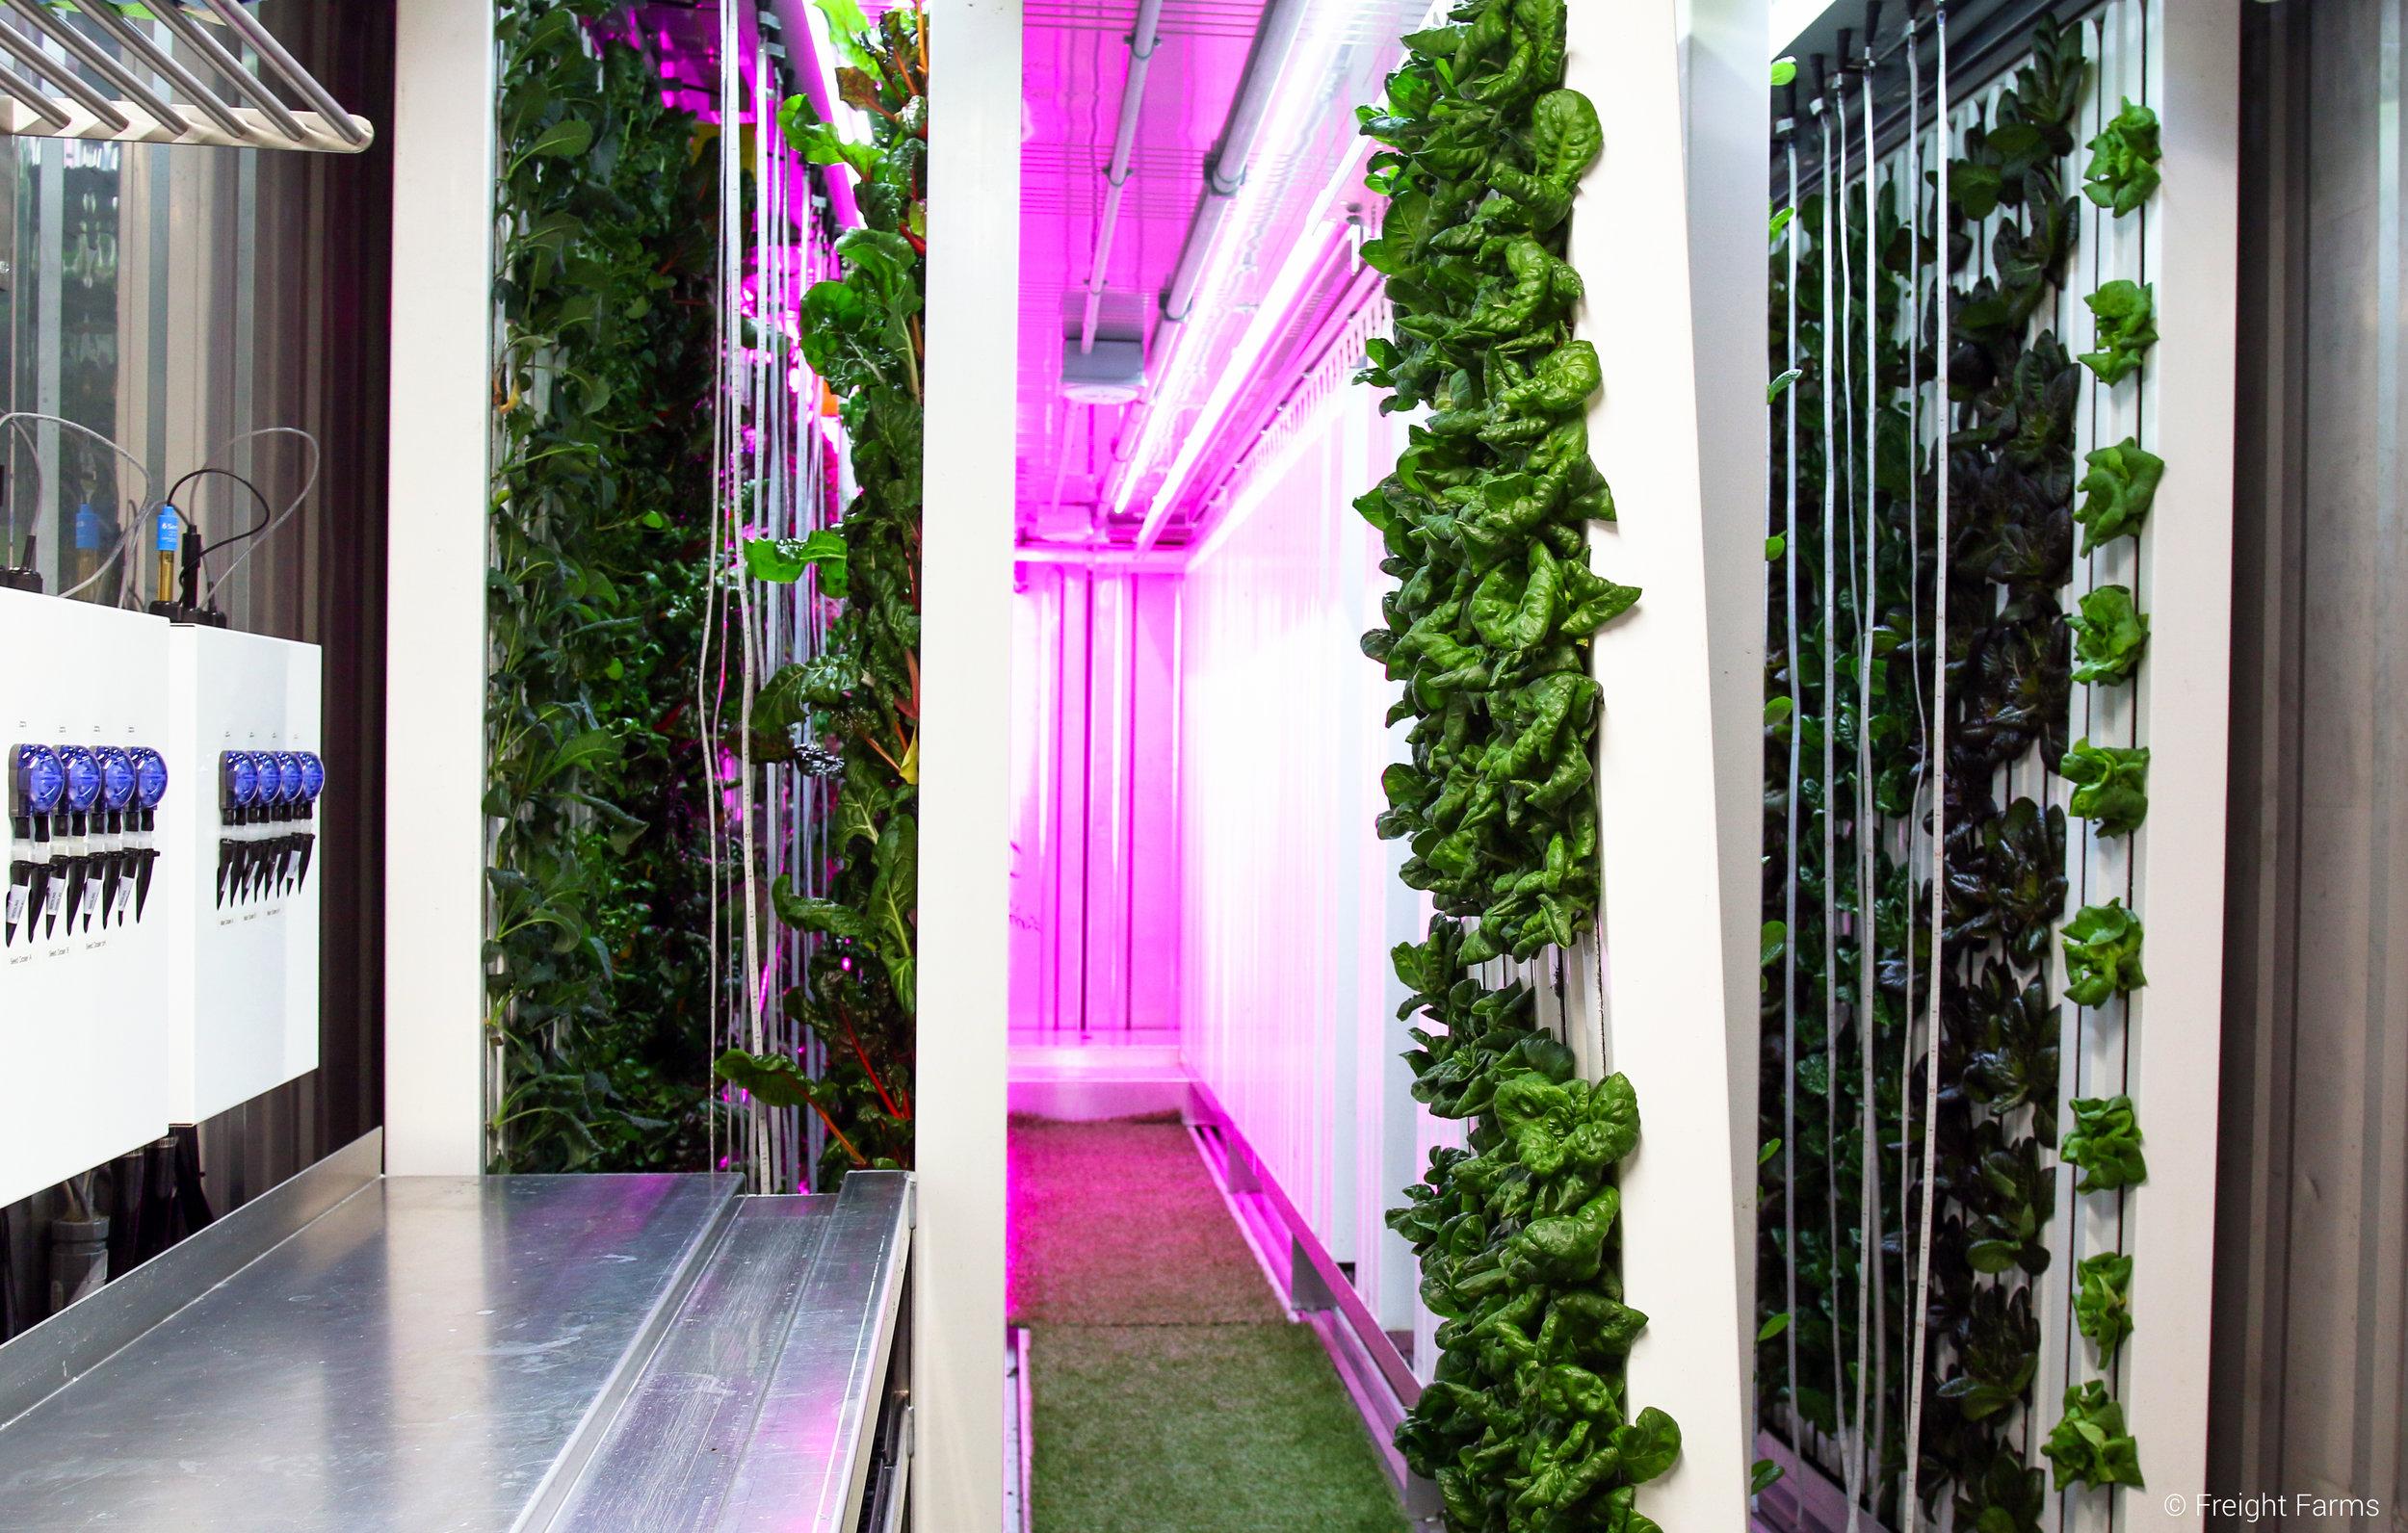 Freight Farms_LGM Interior 3.jpg